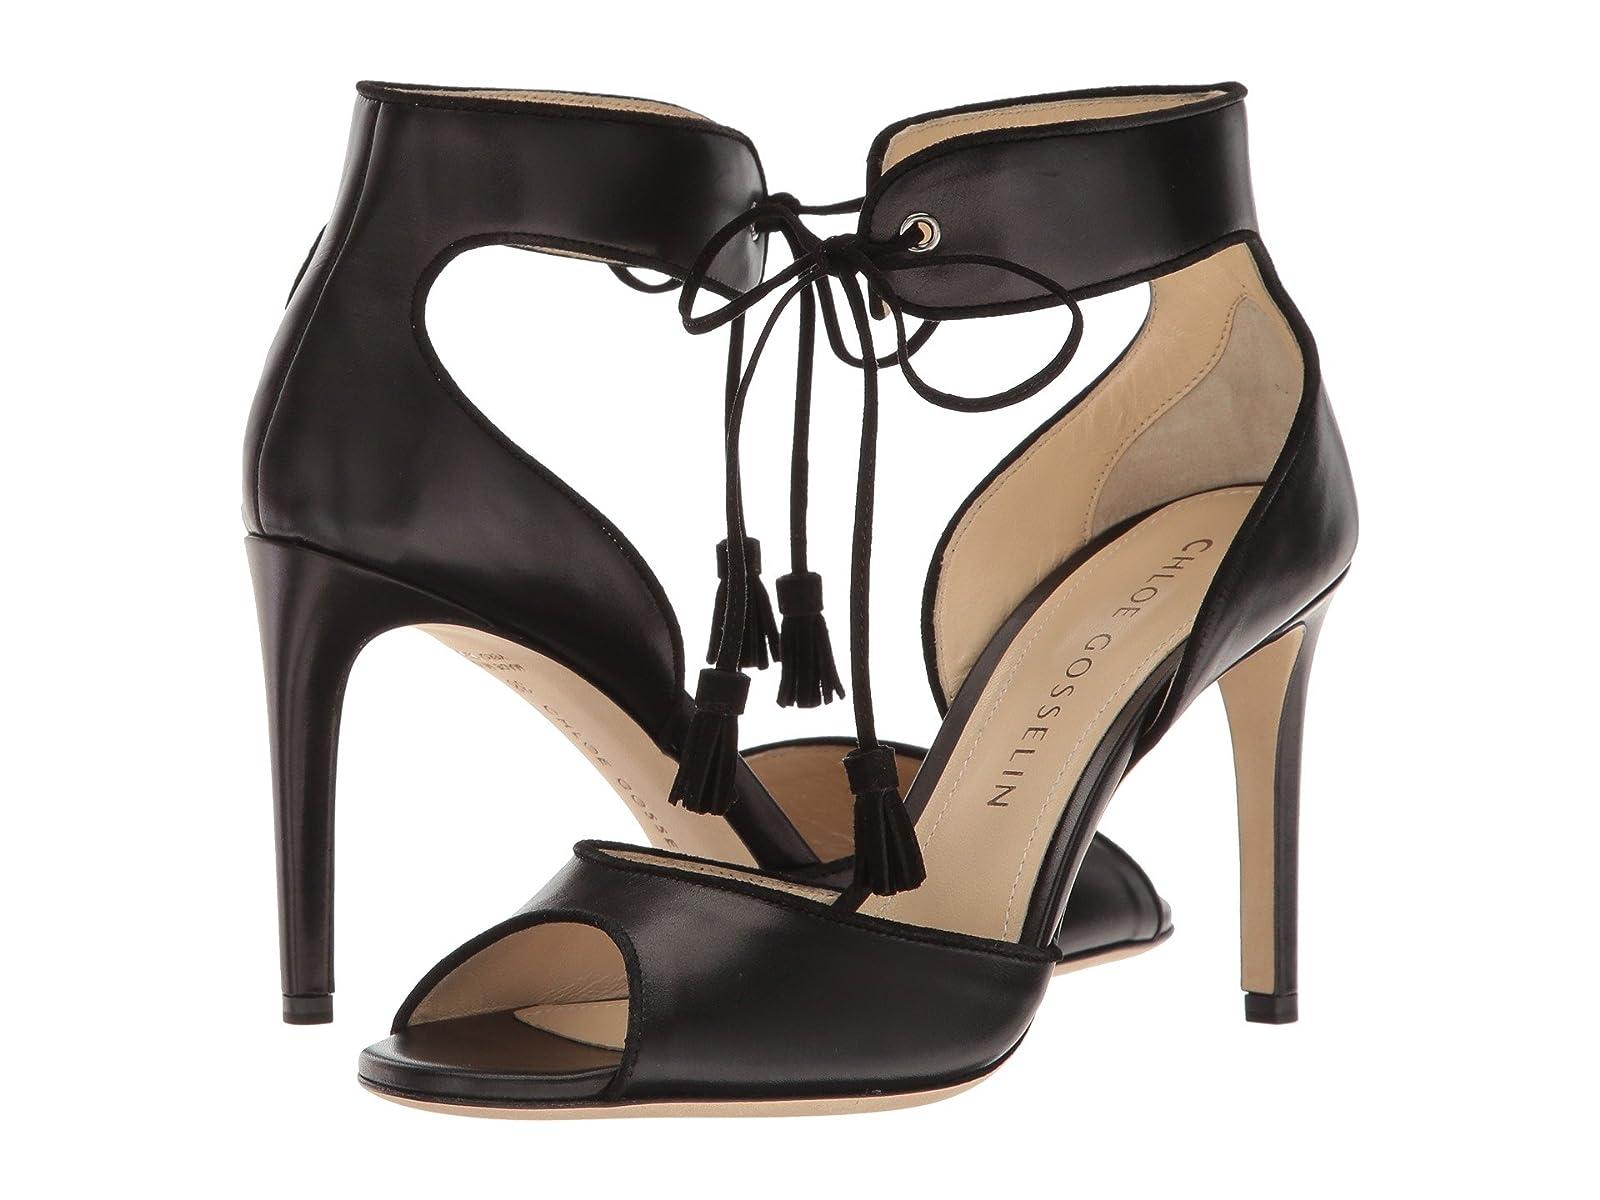 CHLOE GOSSELIN AnemoneCheap and distinctive eye-catching shoes